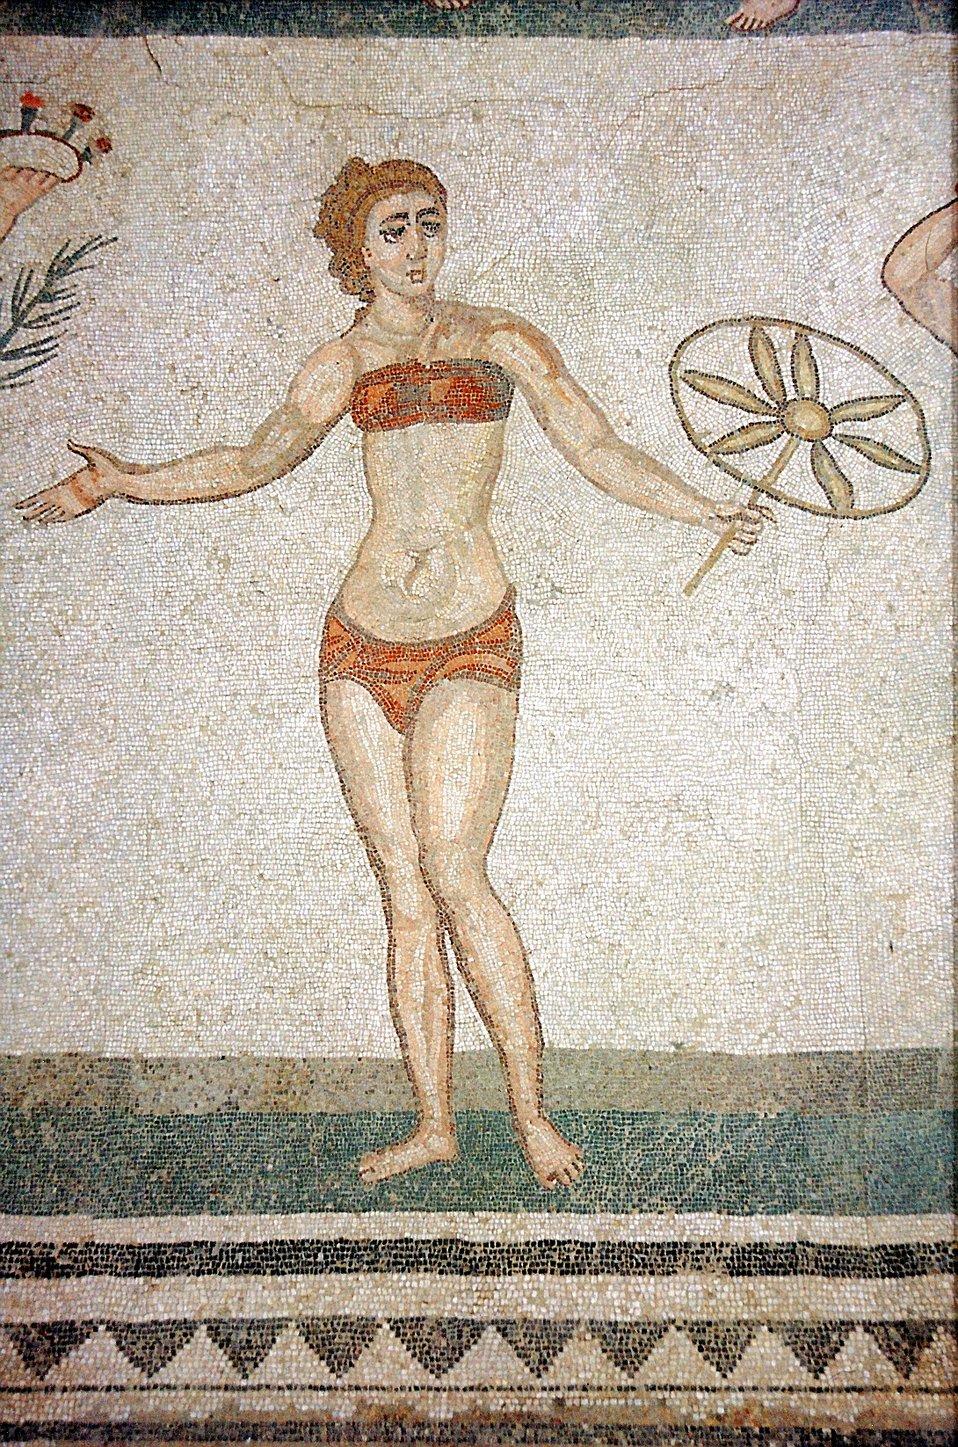 PiazzaArmerina-Mosaik-Bikini.jpg